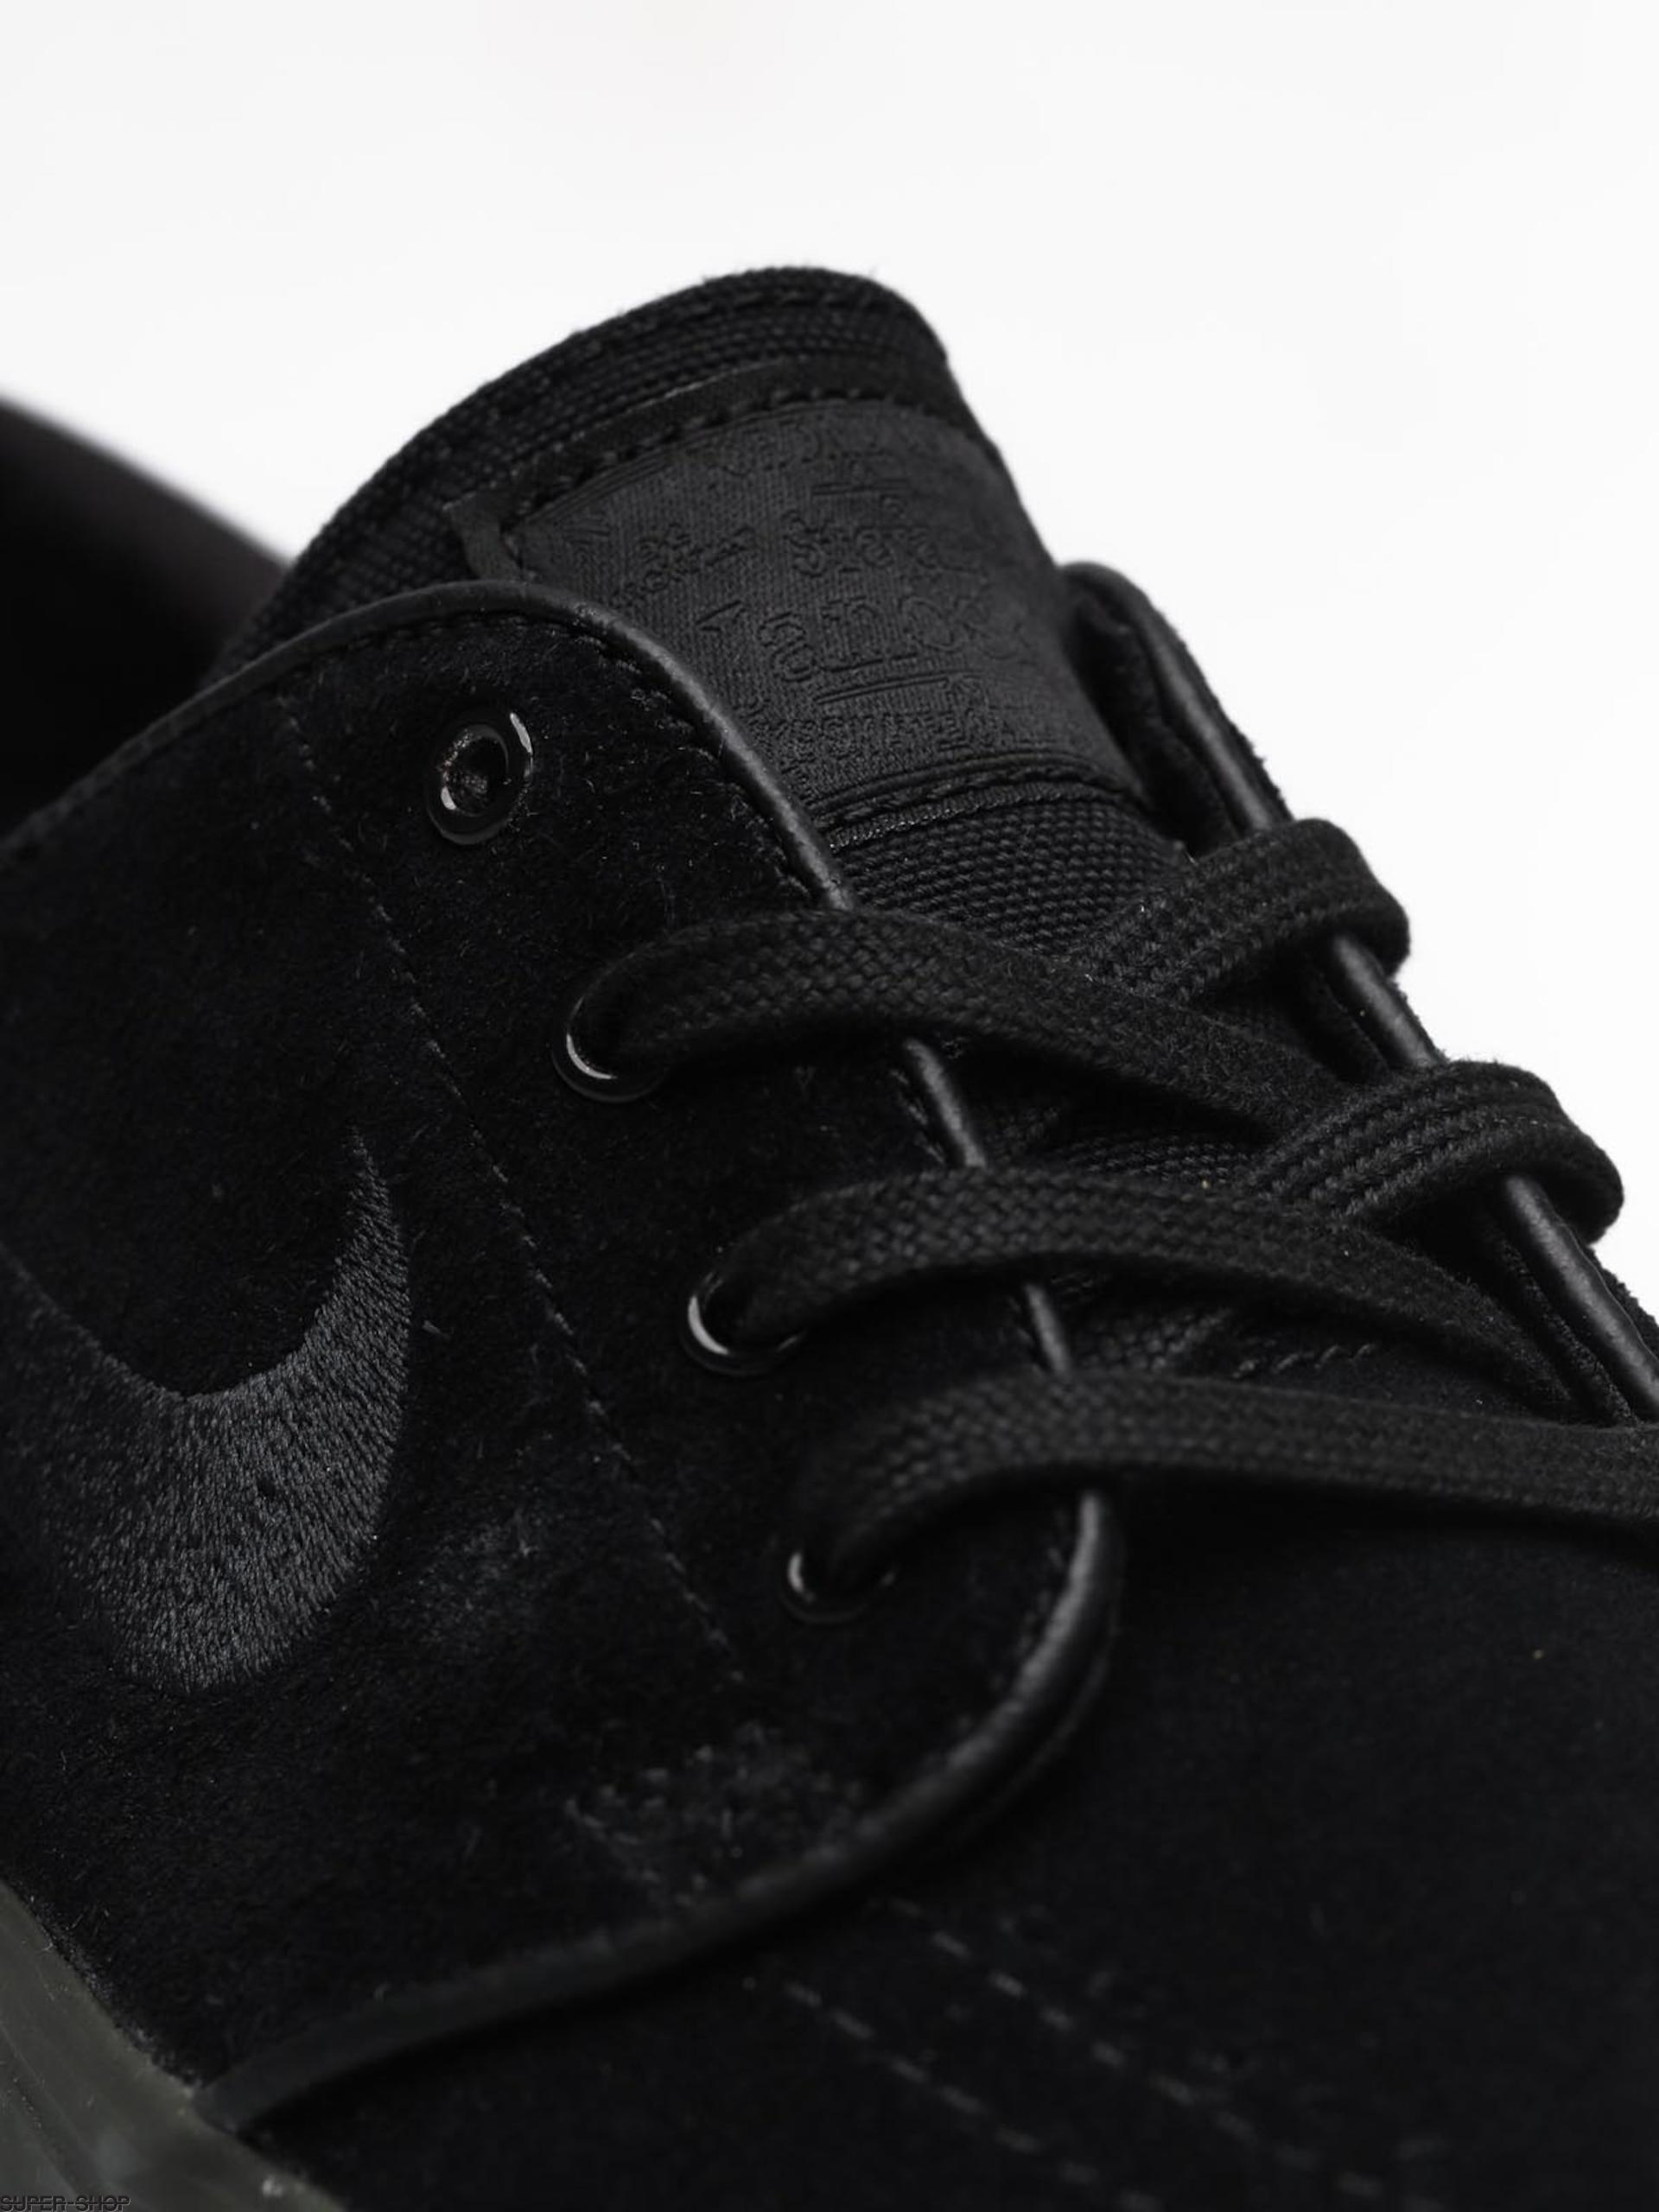 a11c1eddf1 998601-w1920-nike-sb-zoom-stefan-janoski-shoes-black-black-sequoia.jpg